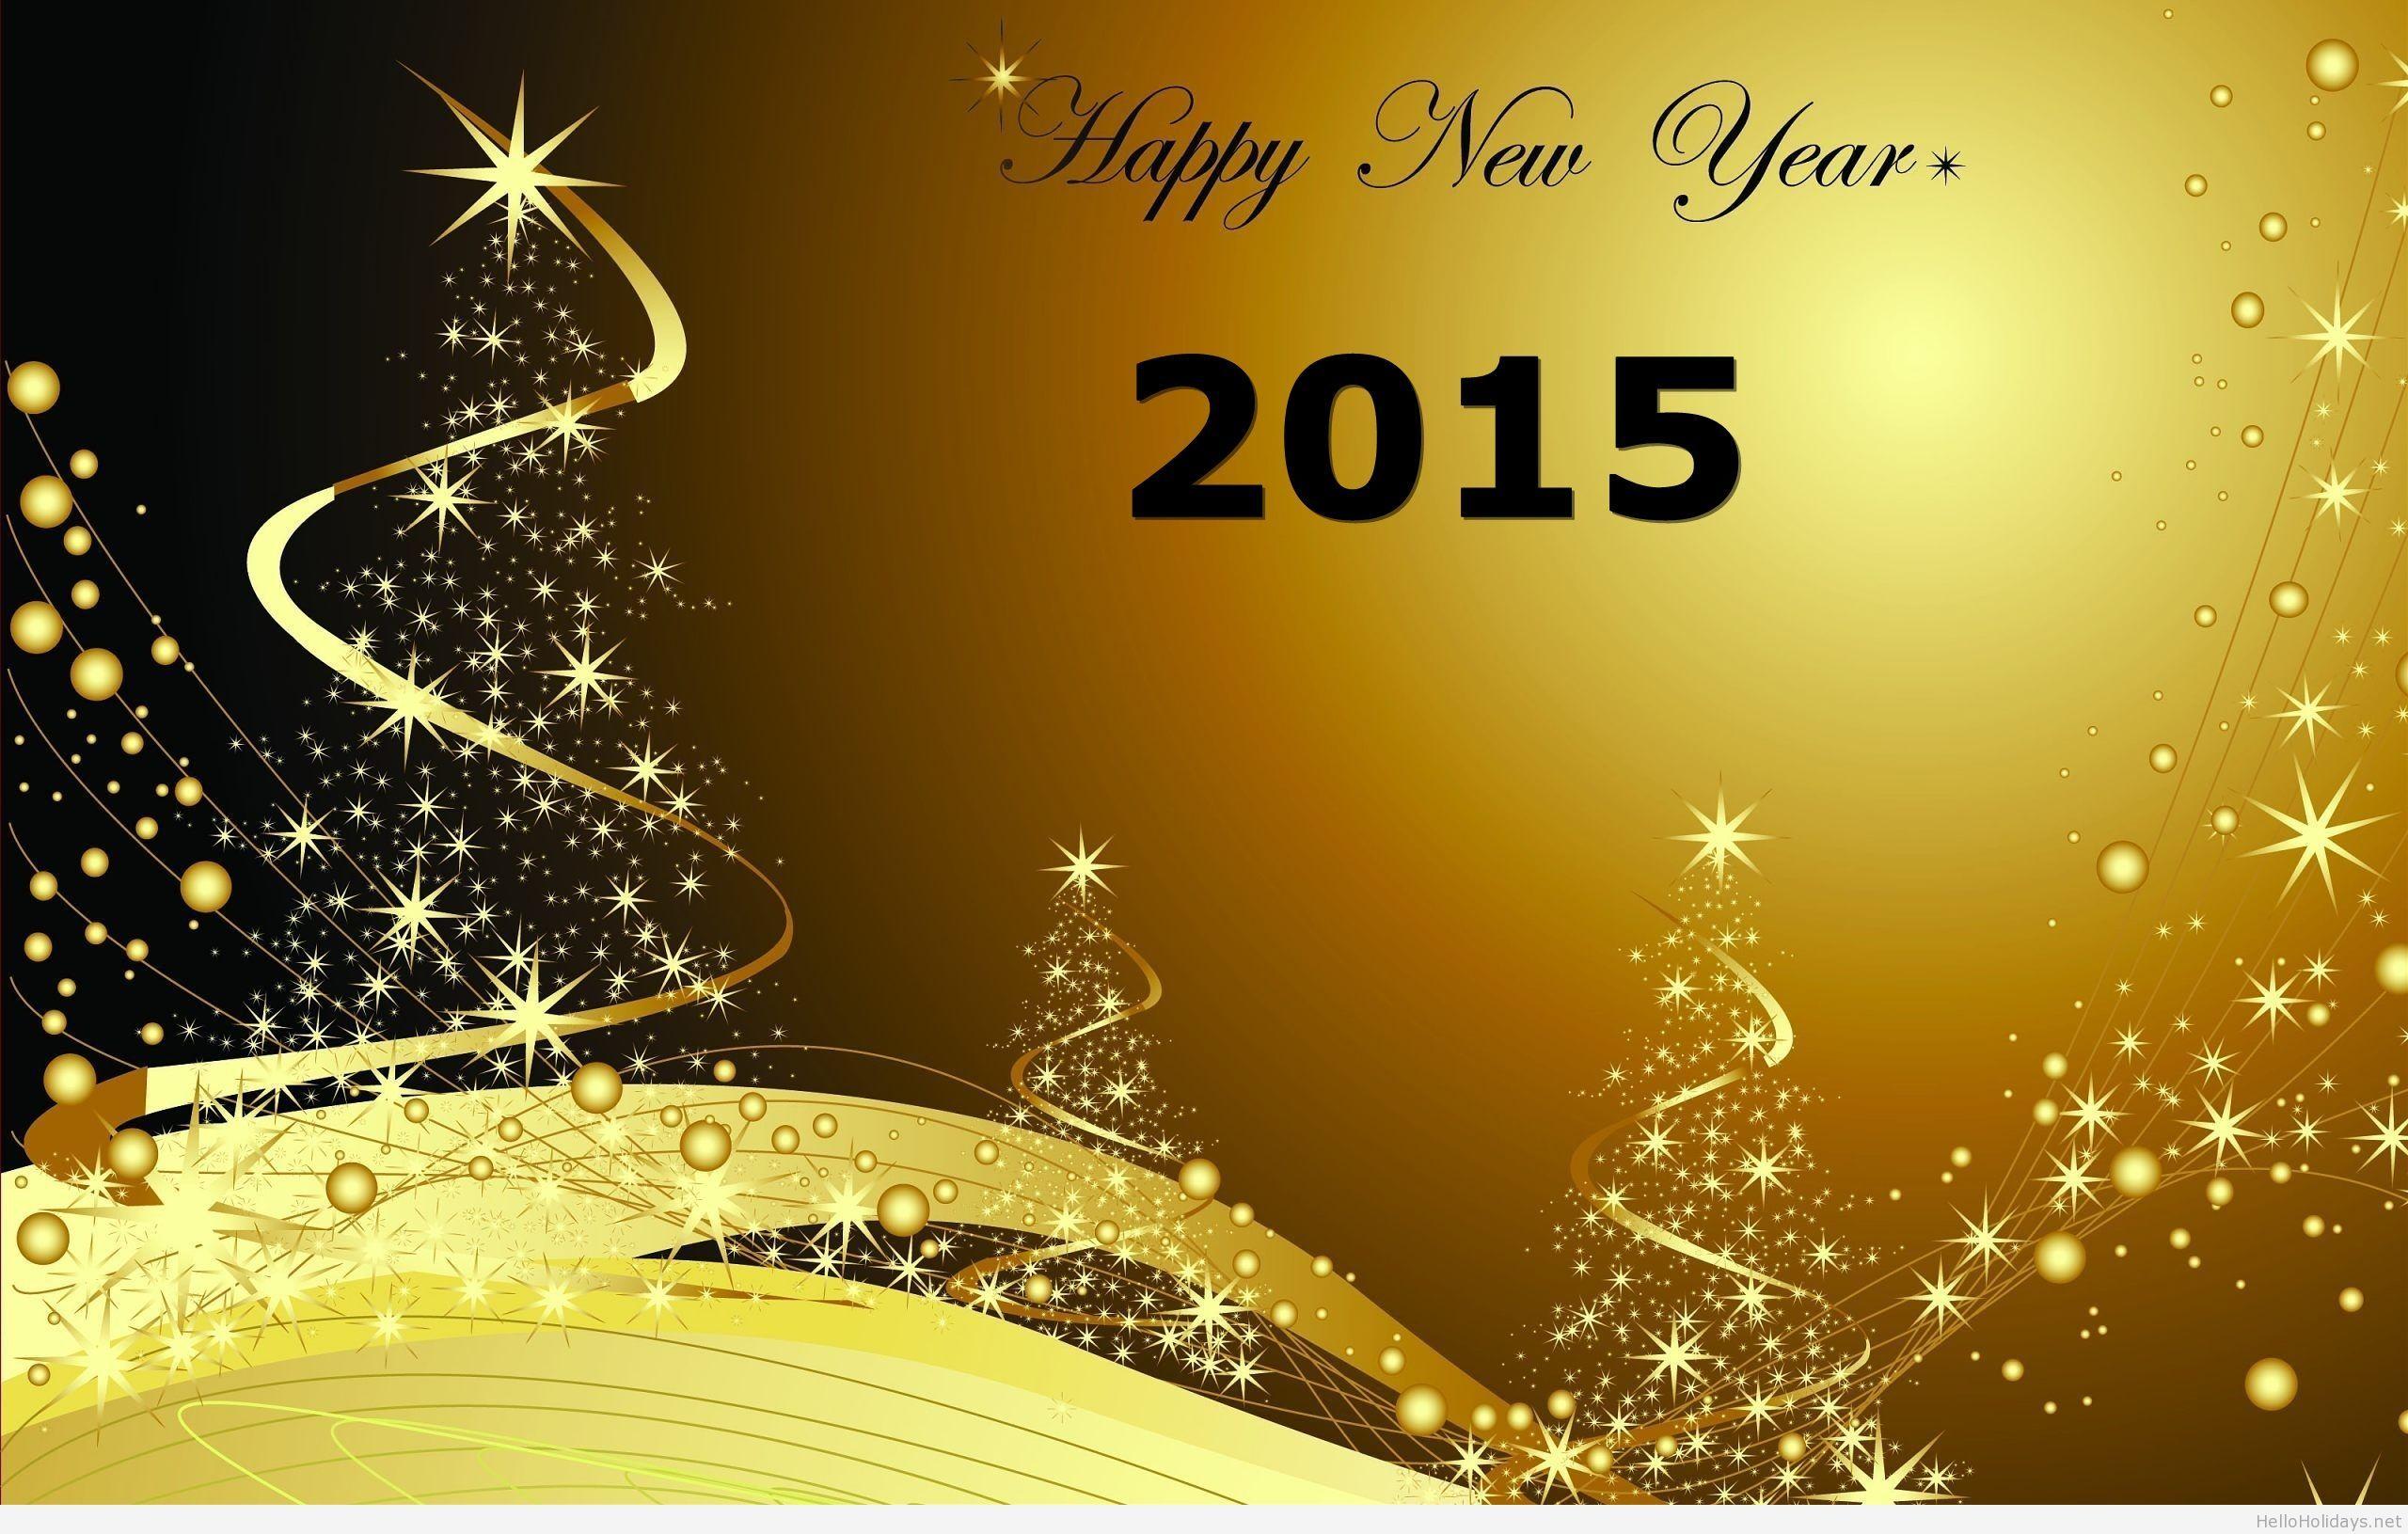 Happy New Year 2015 wallpaper image Life Happy new year 2017 2560x1631